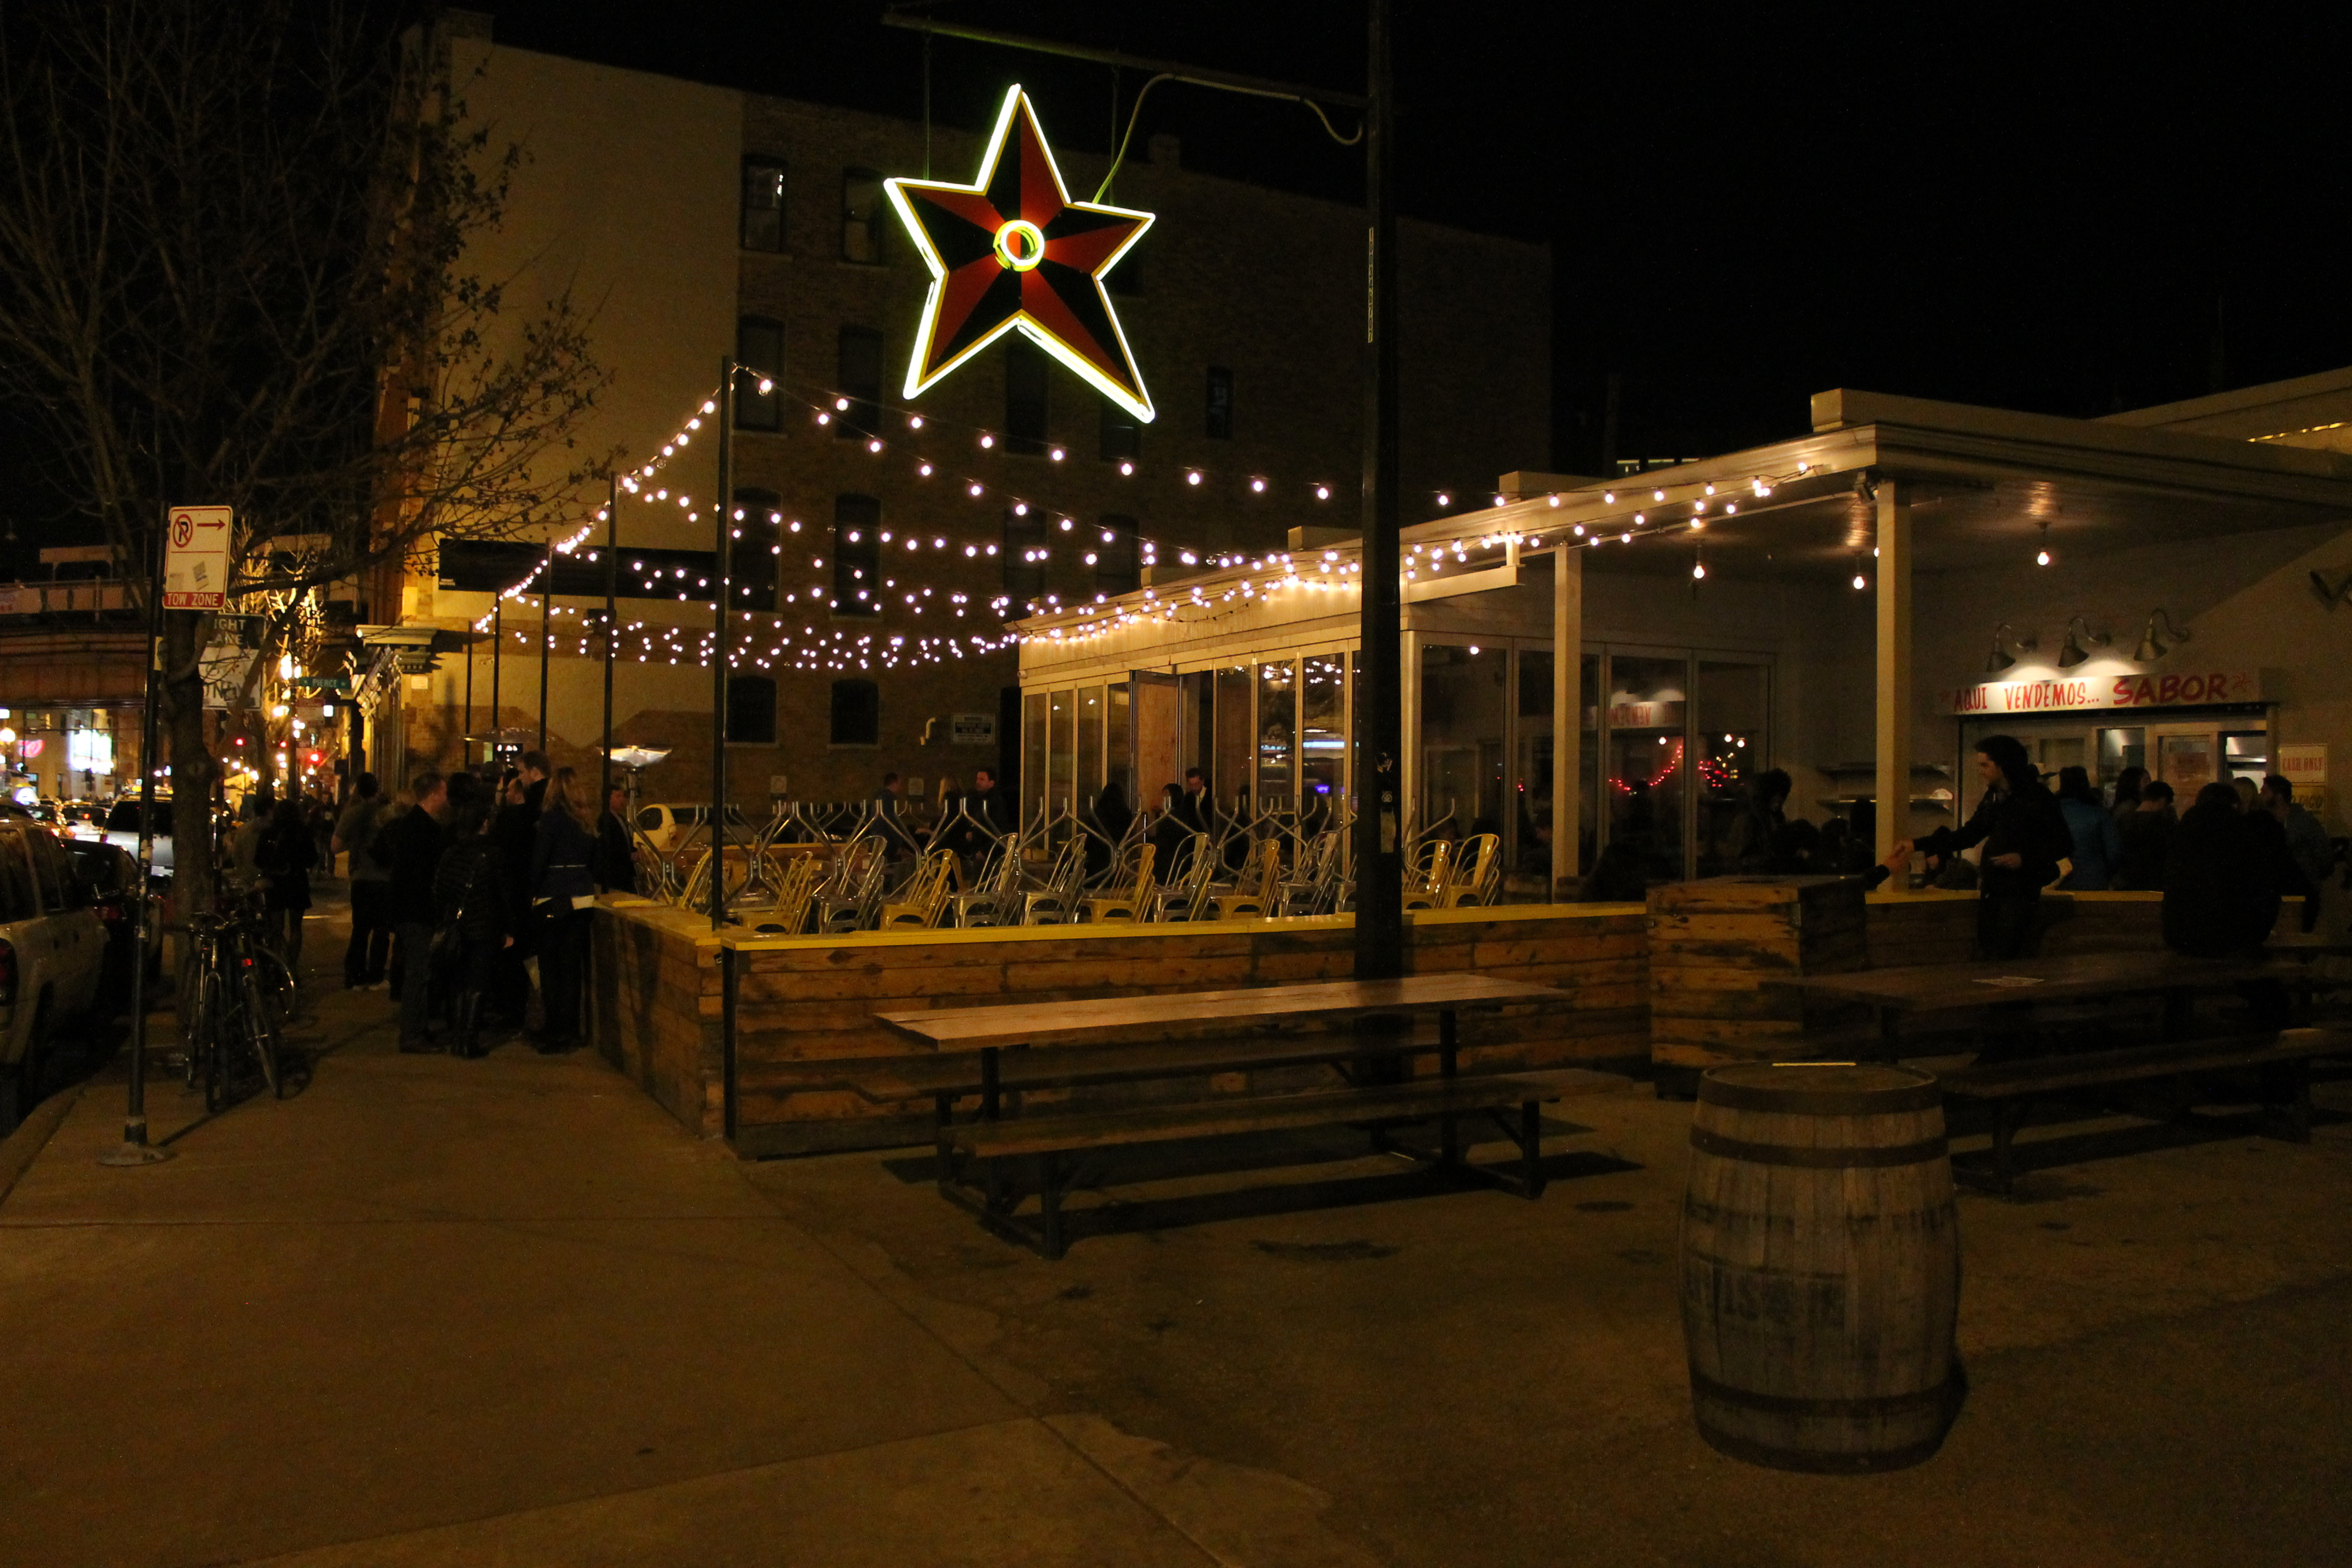 Big Star, Wicker Park, Chicago, Illinois, Post-Gayborhoods